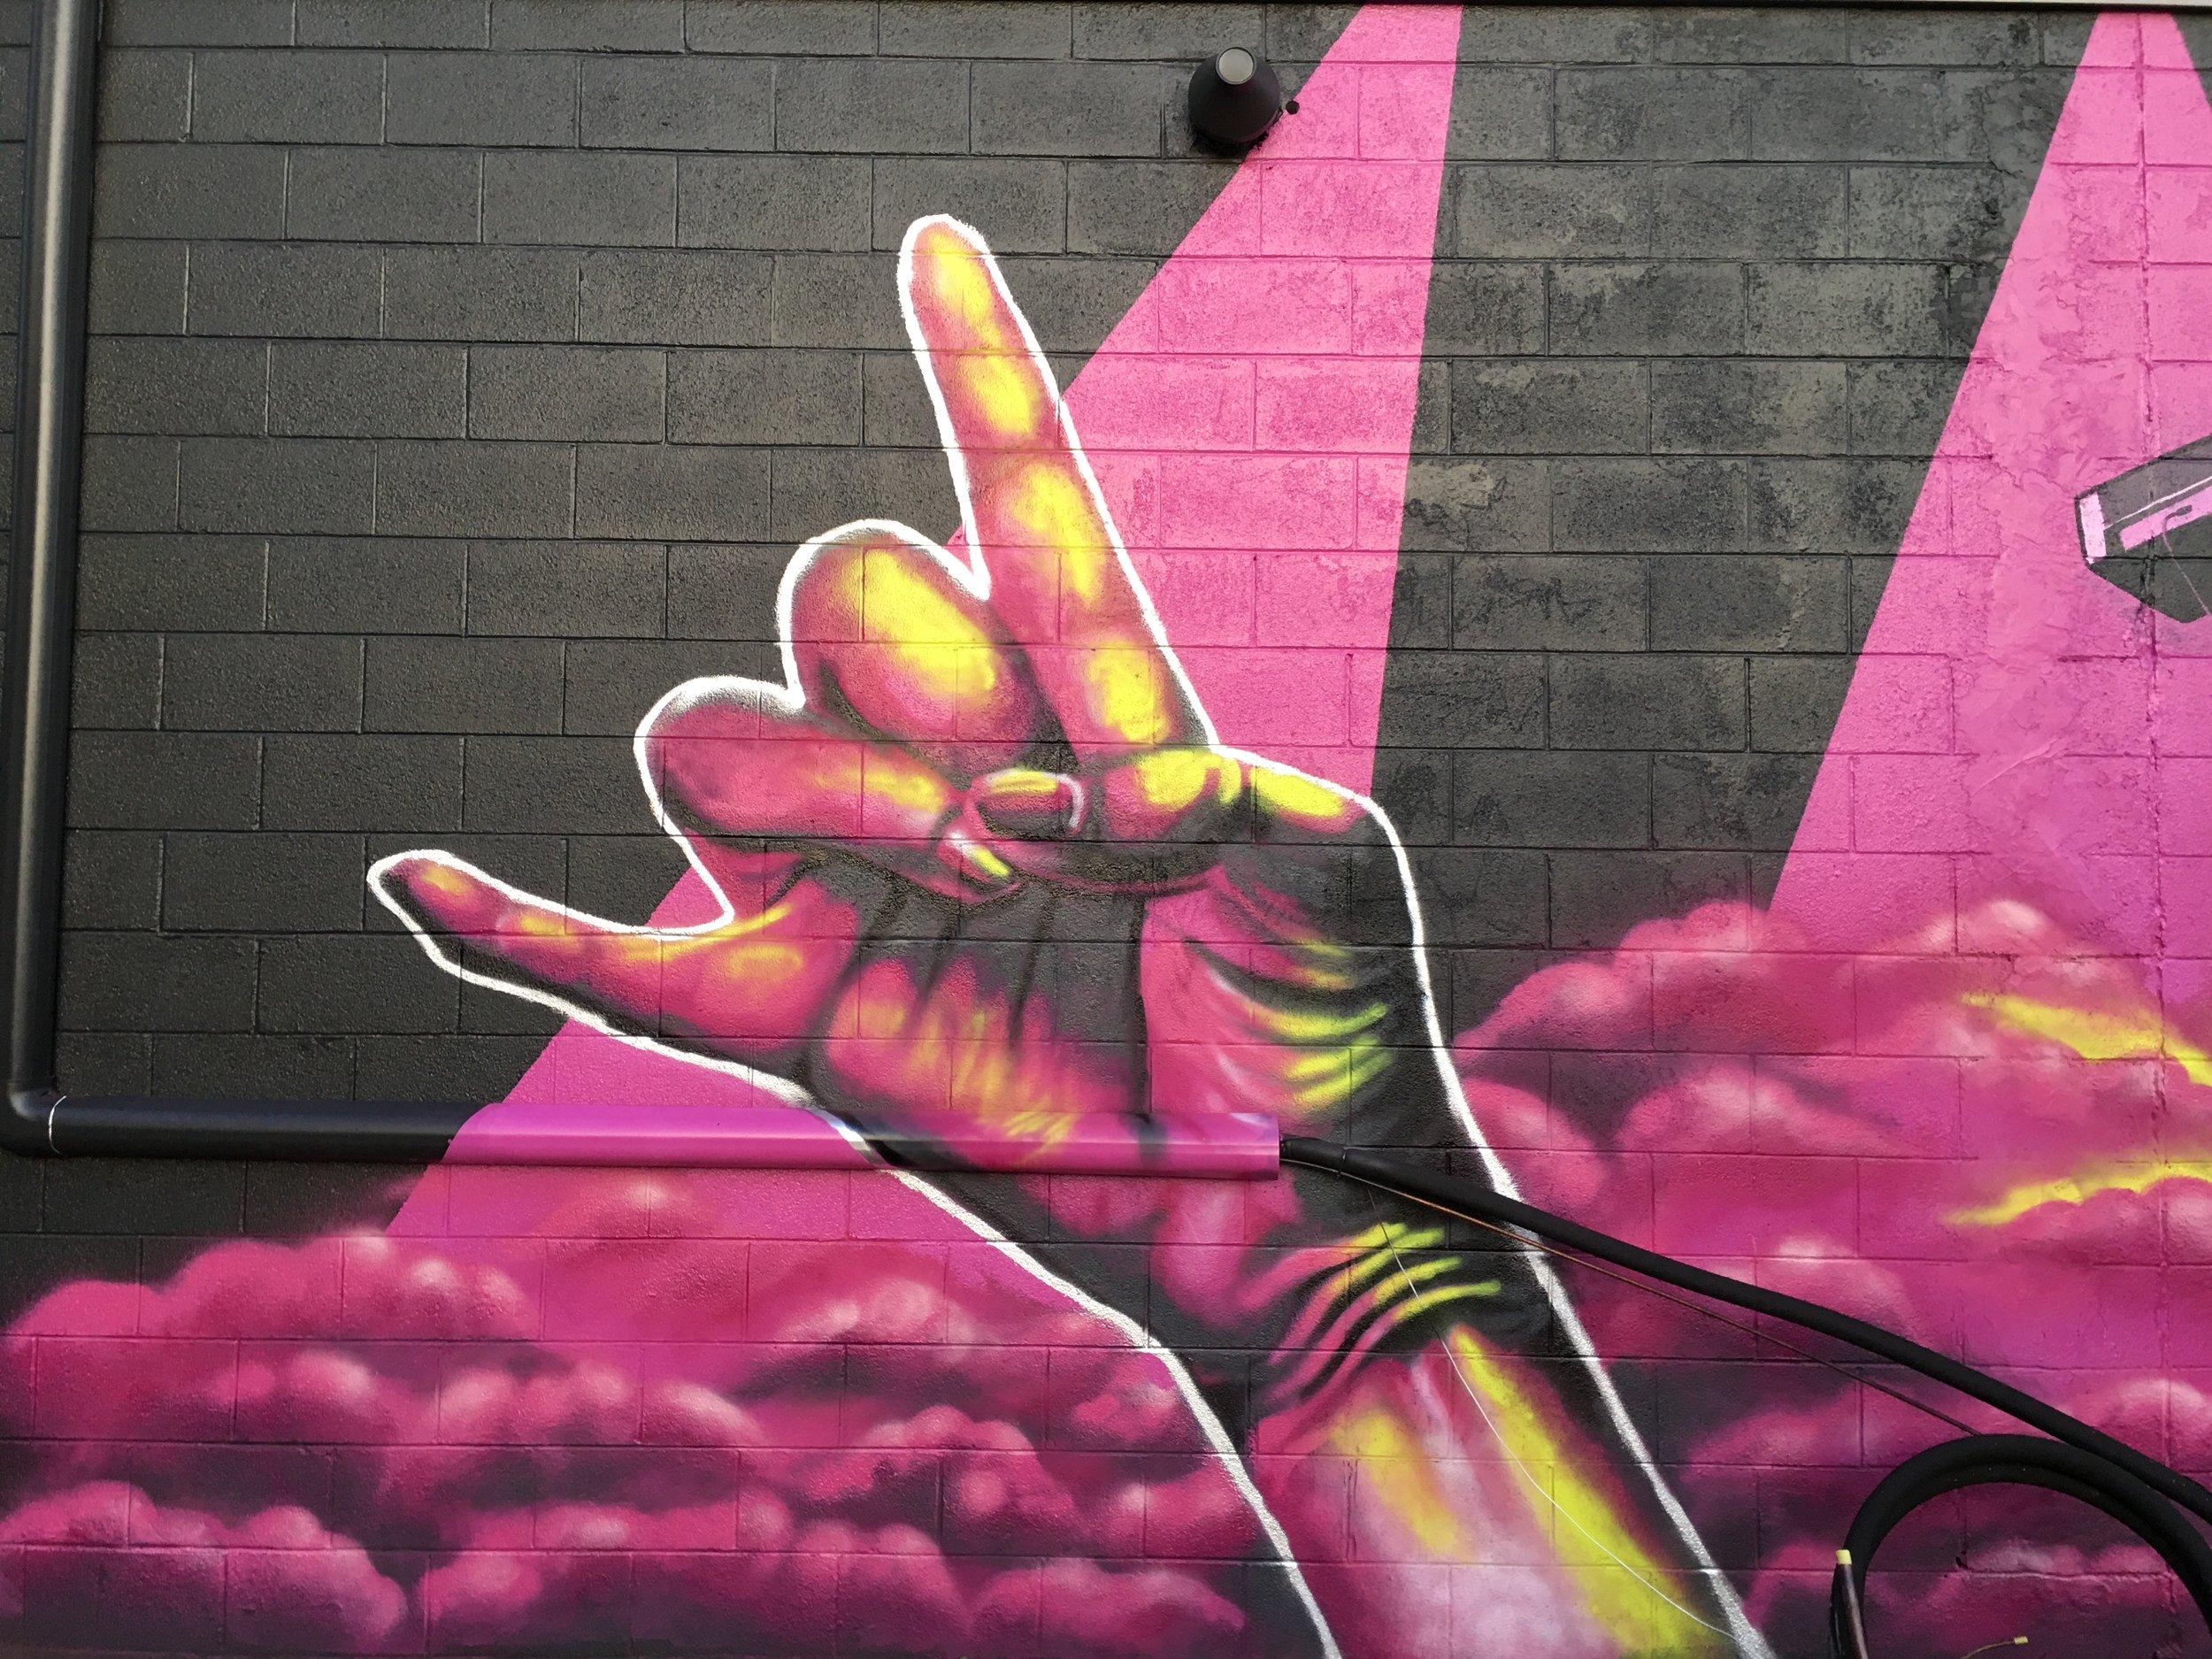 Spray painted hand with purple smoke